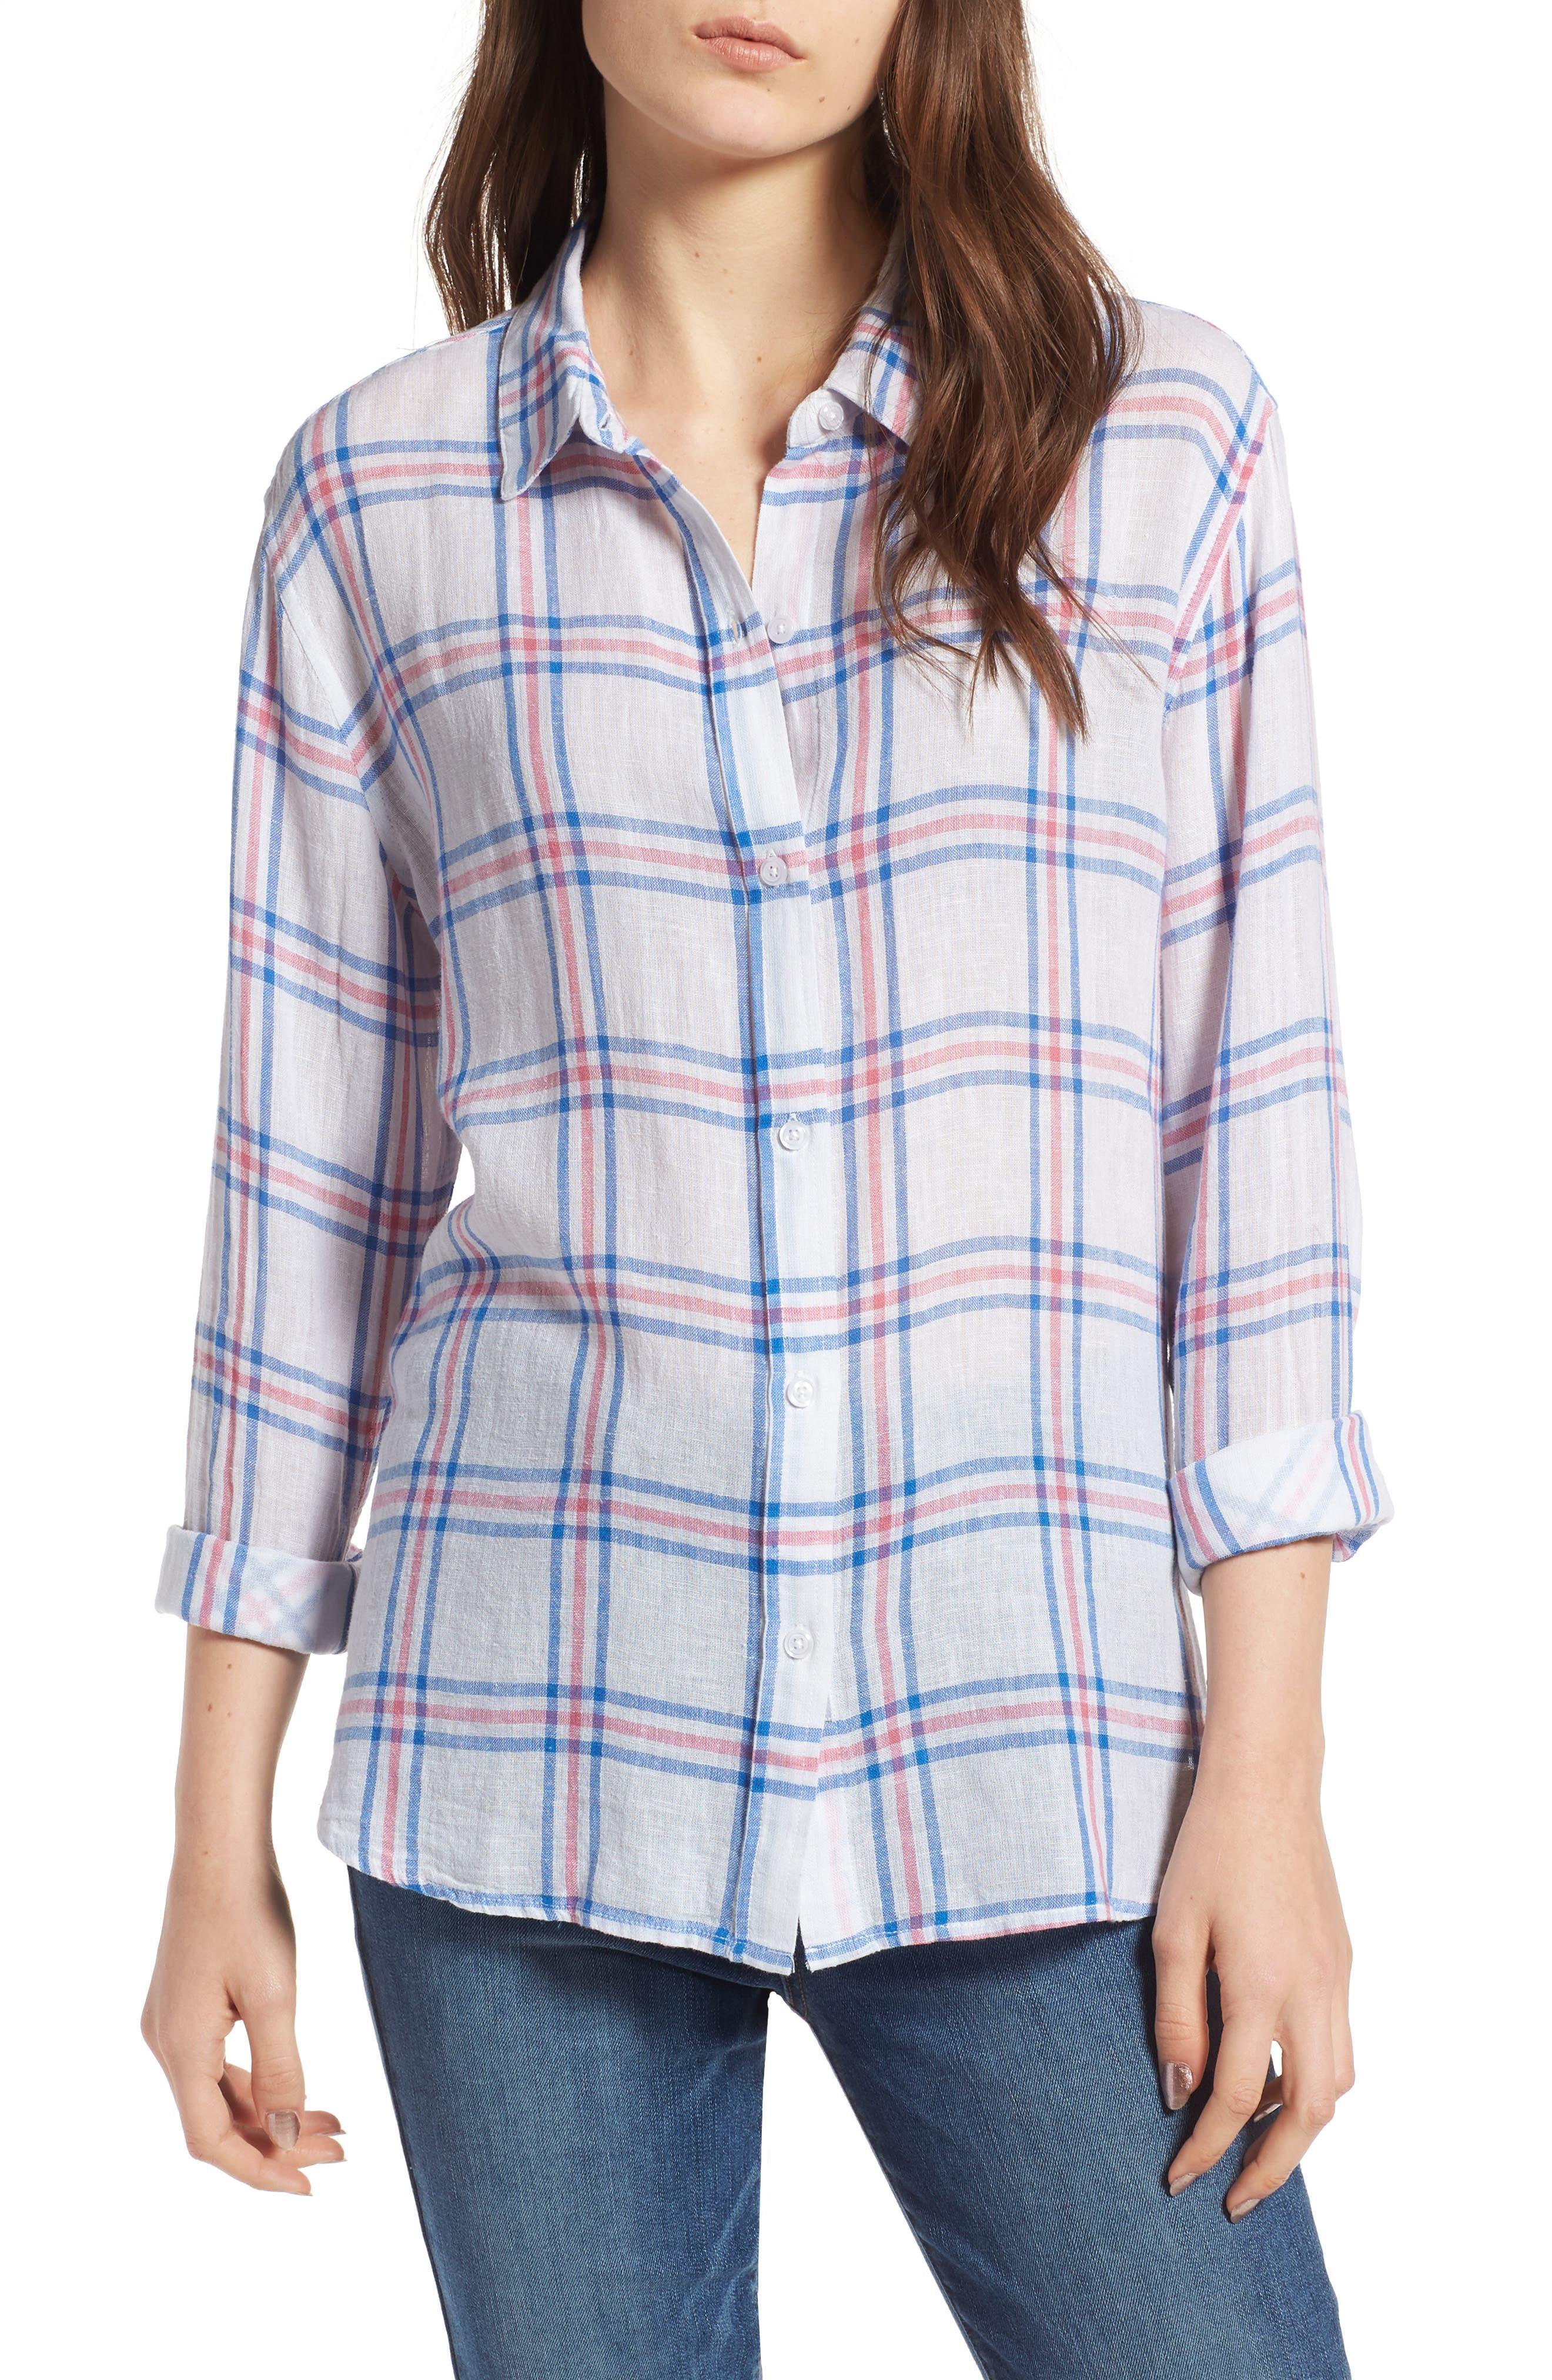 Sydney Stripe Shirt,                             Main thumbnail 1, color,                             Raspberry Azure White